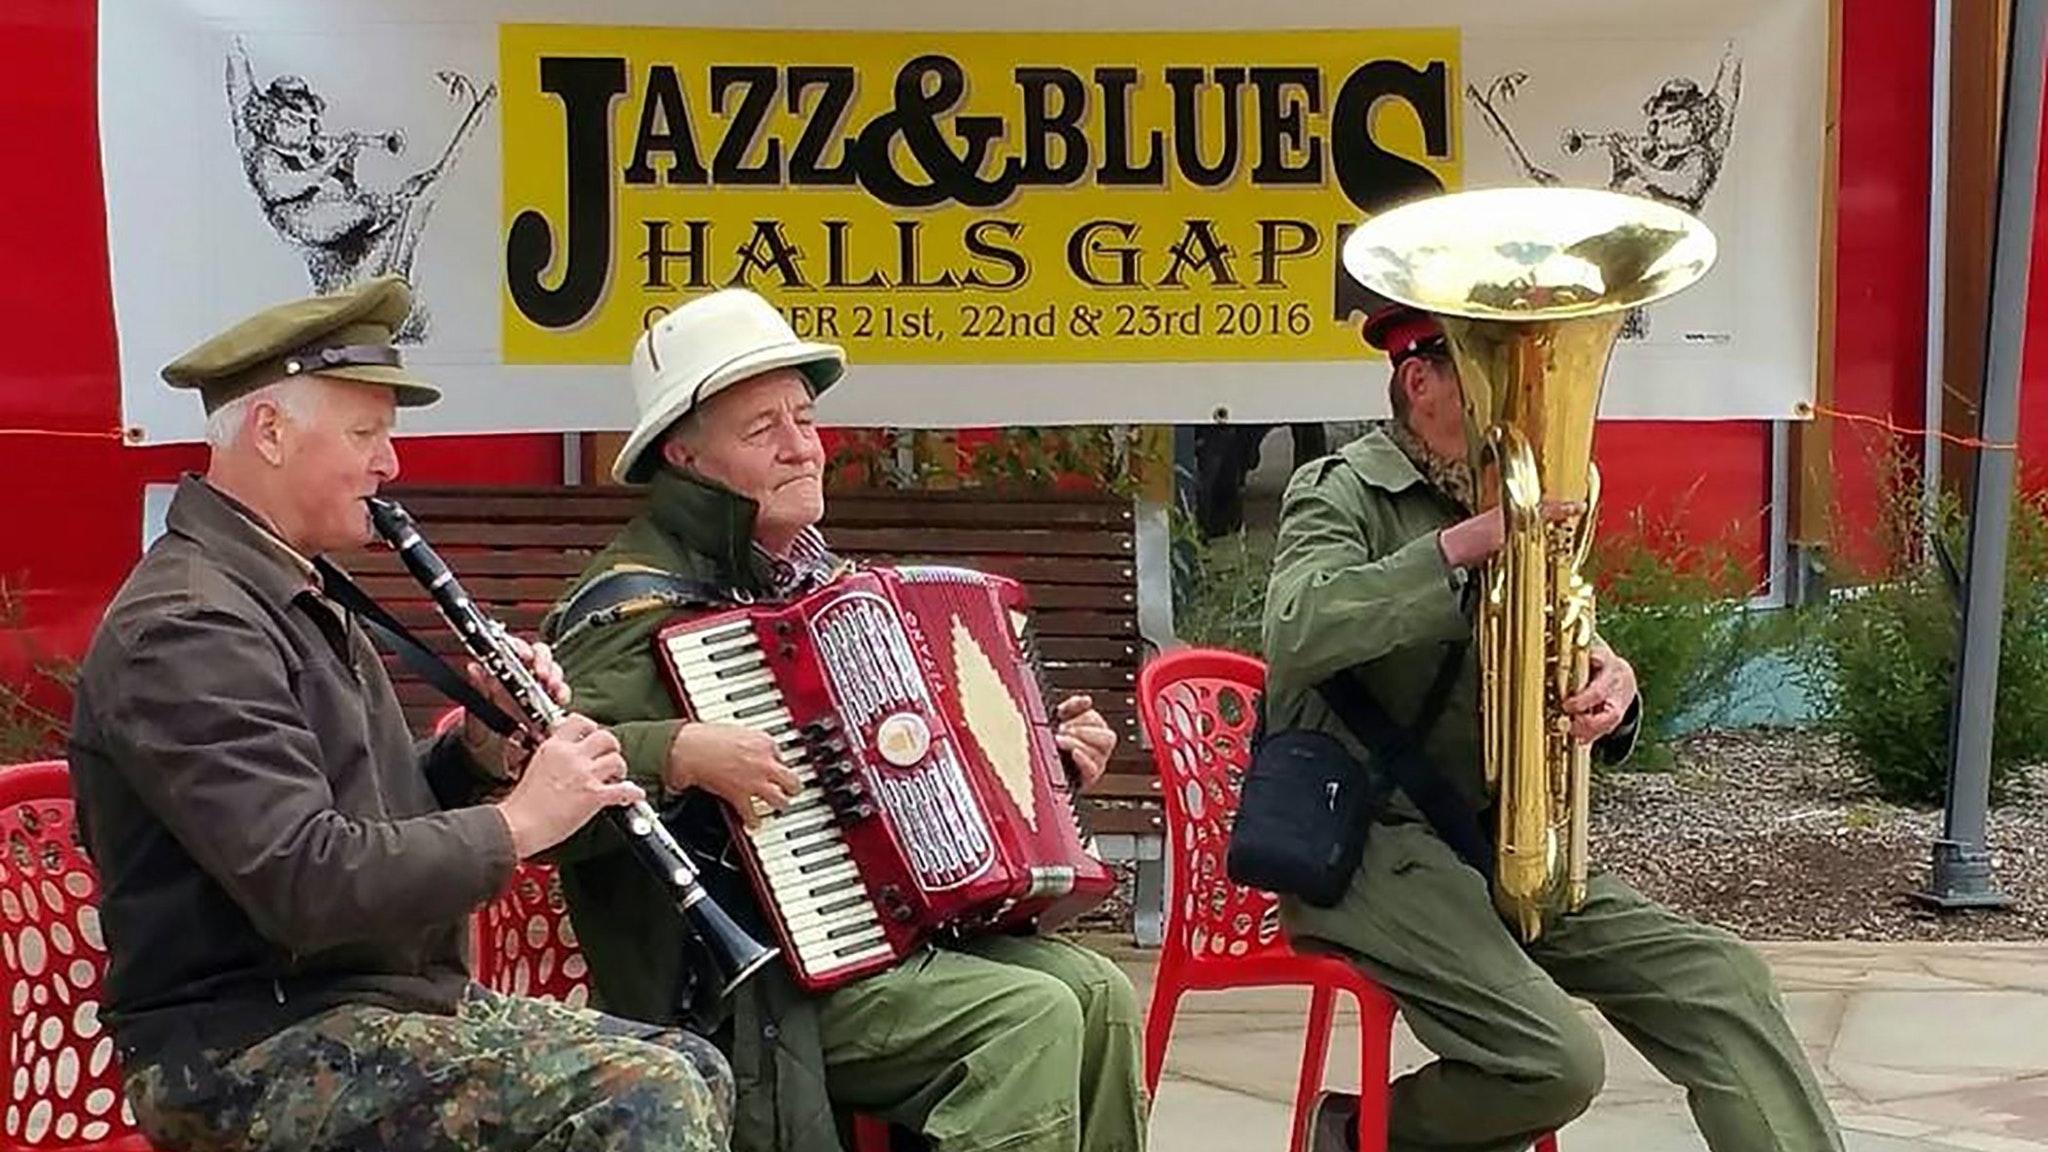 Halls Gap Jazz Blues Festival